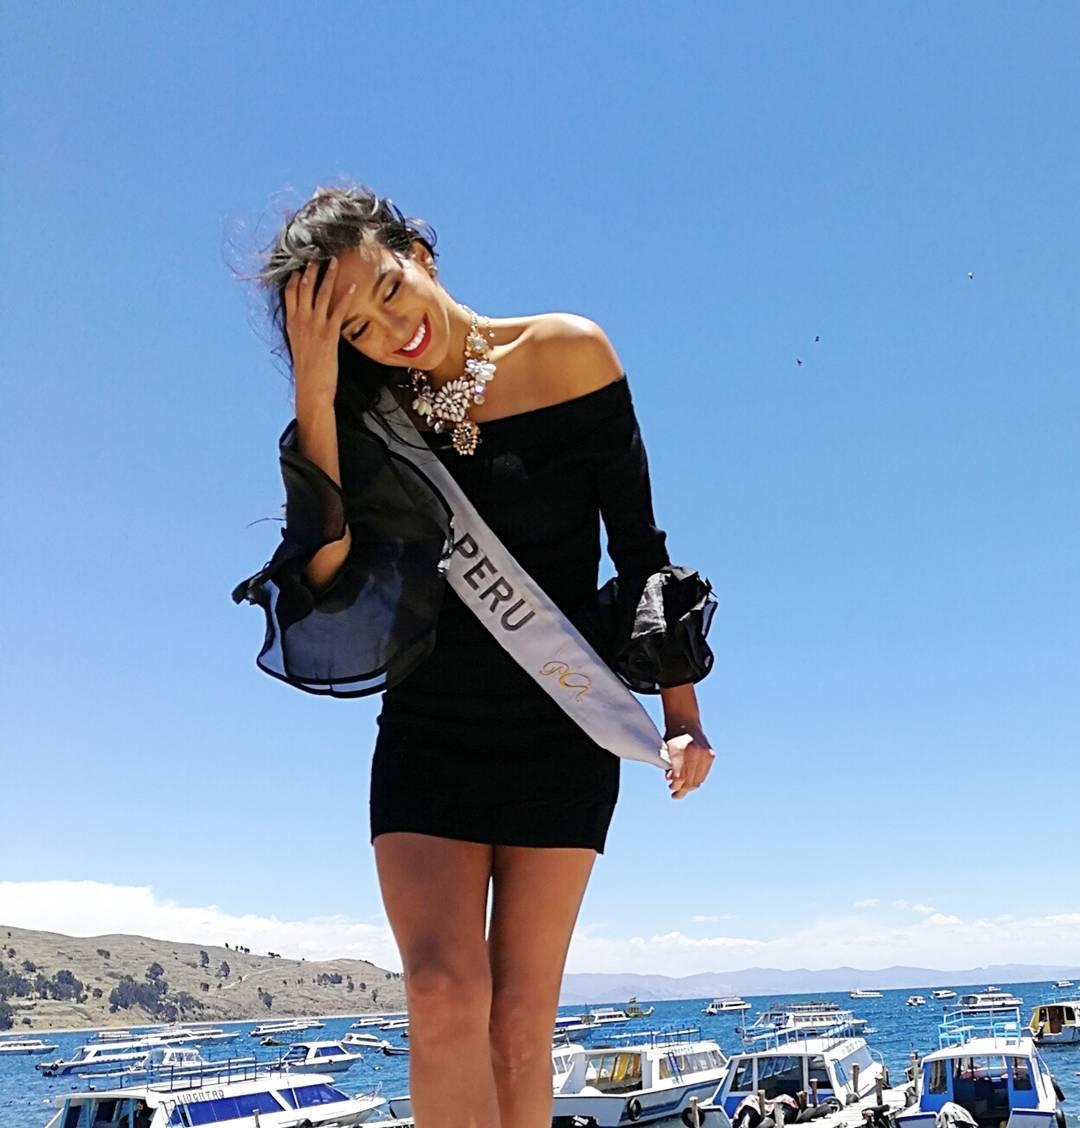 lorena larriviere, 8va finalista de reyna hispanoamericana 2017/miss supranational peru 2015. - Página 5 22857510